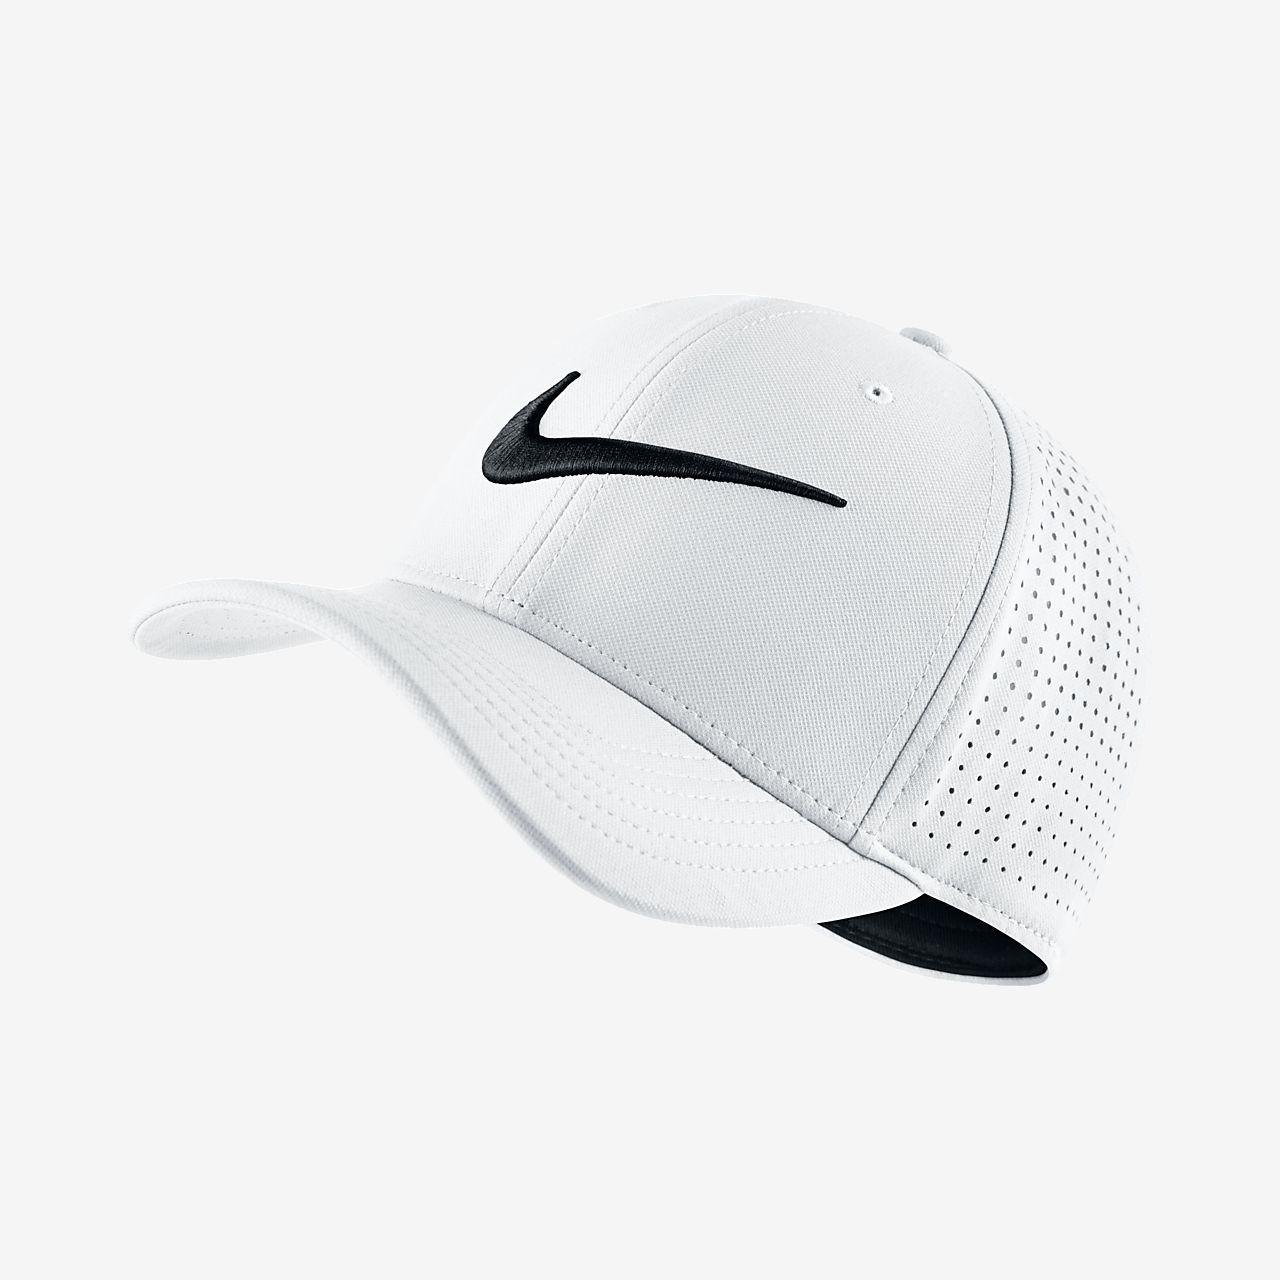 Keps Nike Vapor Classic 99 SF